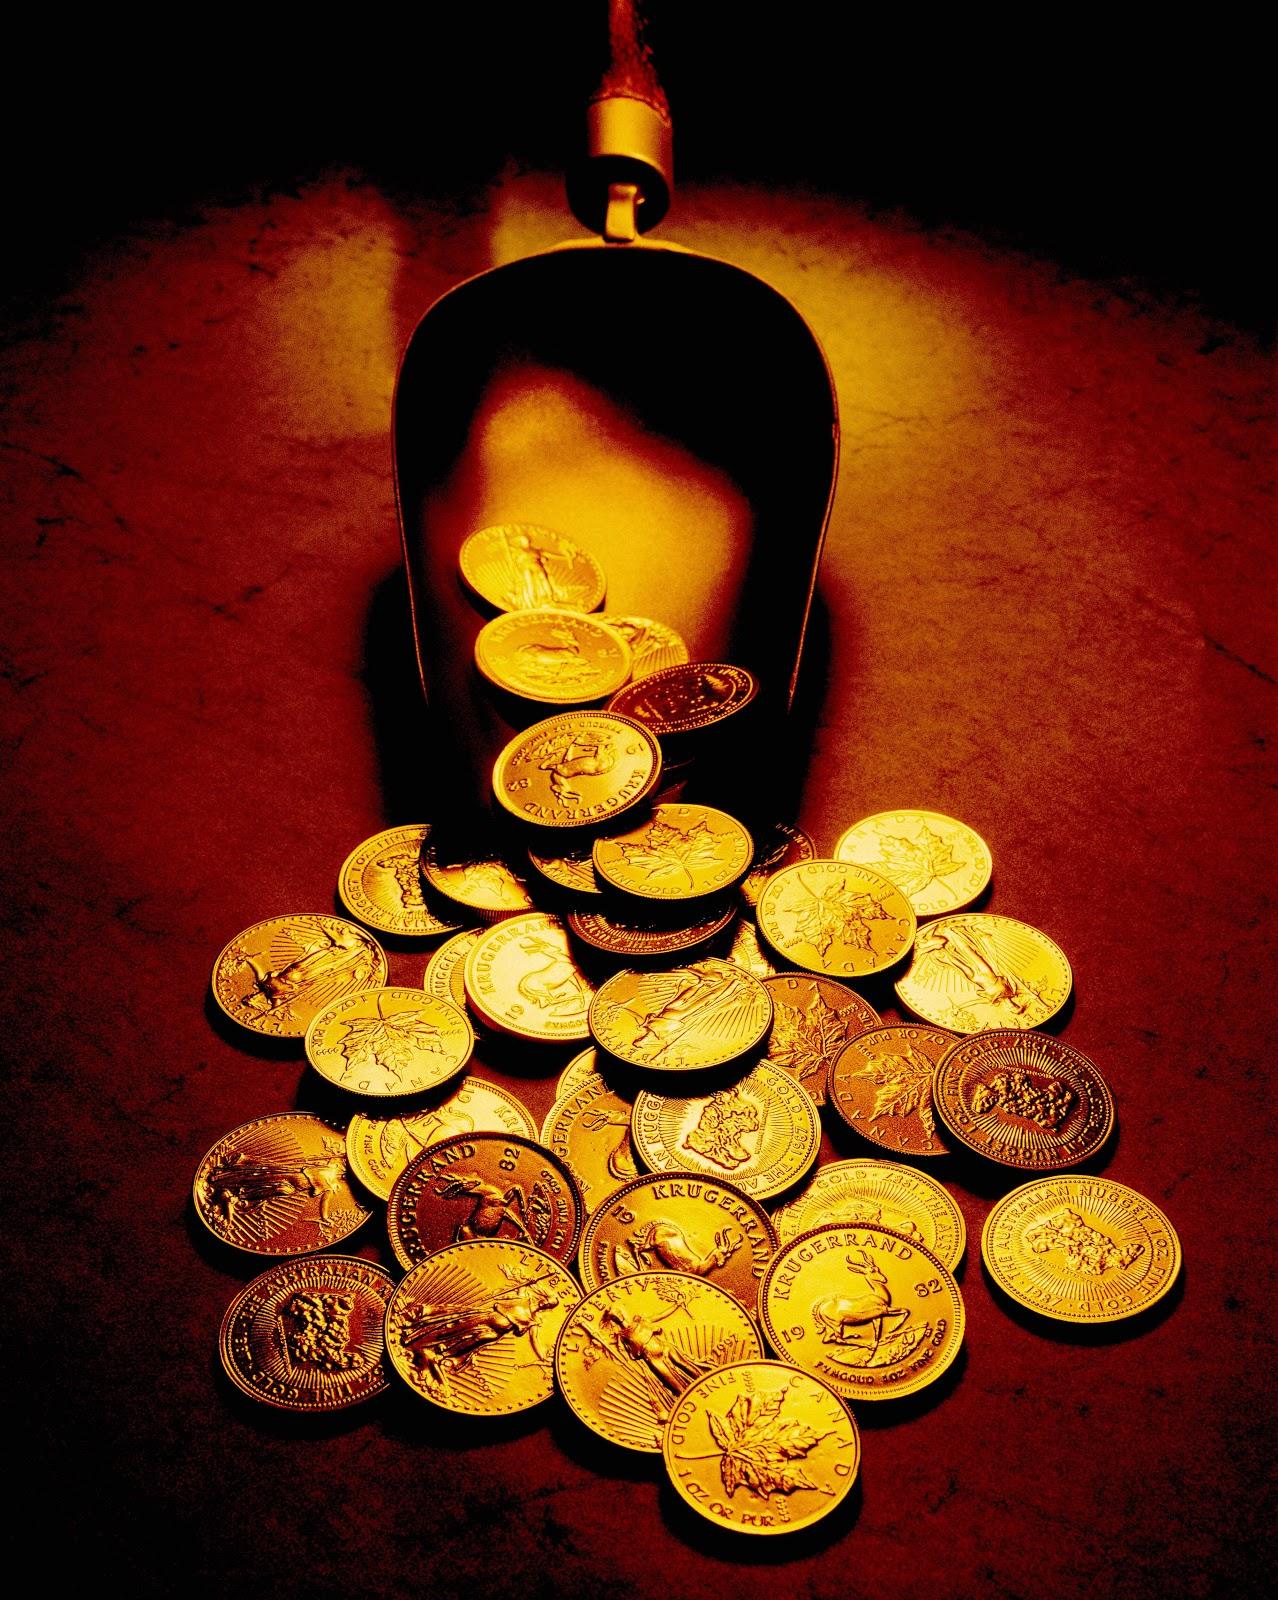 http://3.bp.blogspot.com/-42iCMbVH1Gw/UI4L5kNHT8I/AAAAAAAAI38/m_VXn8mgKFc/s1600/beautiful-hq-gold-coins-wallpaper.jpg